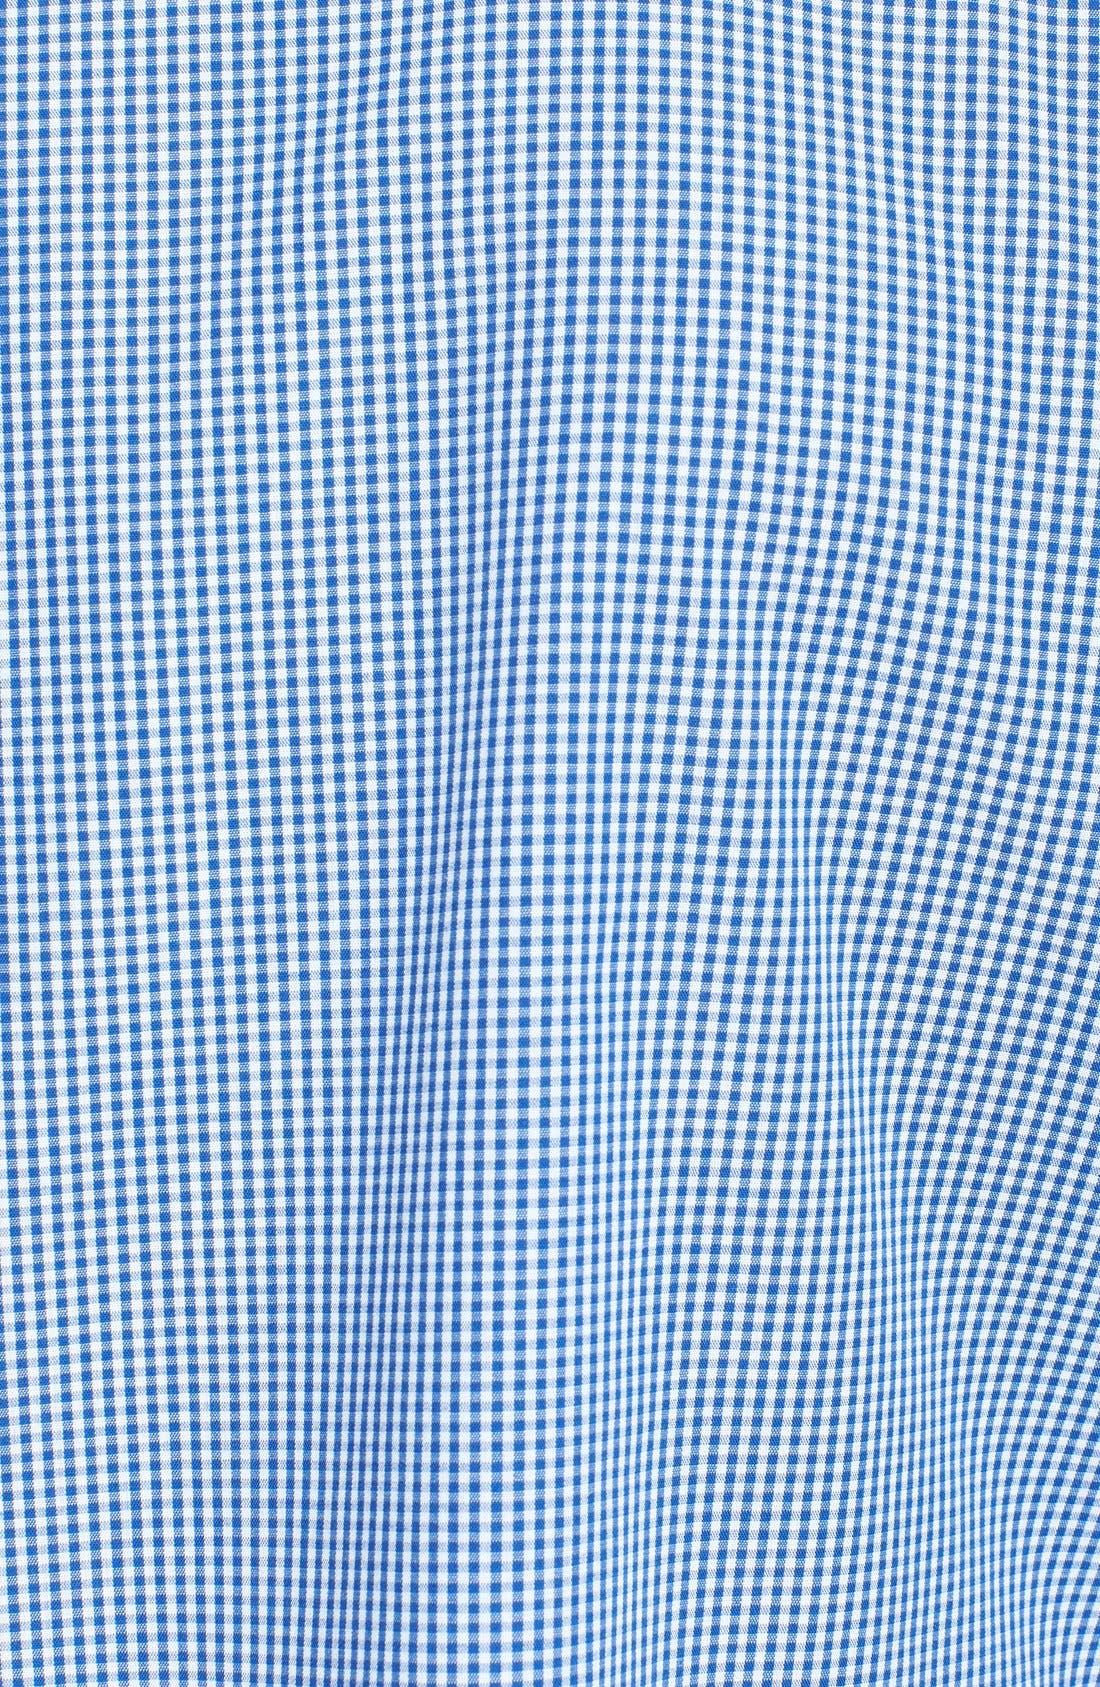 Alternate Image 3  - Topman Slim Fit Chambray Trimmed Gingham Shirt